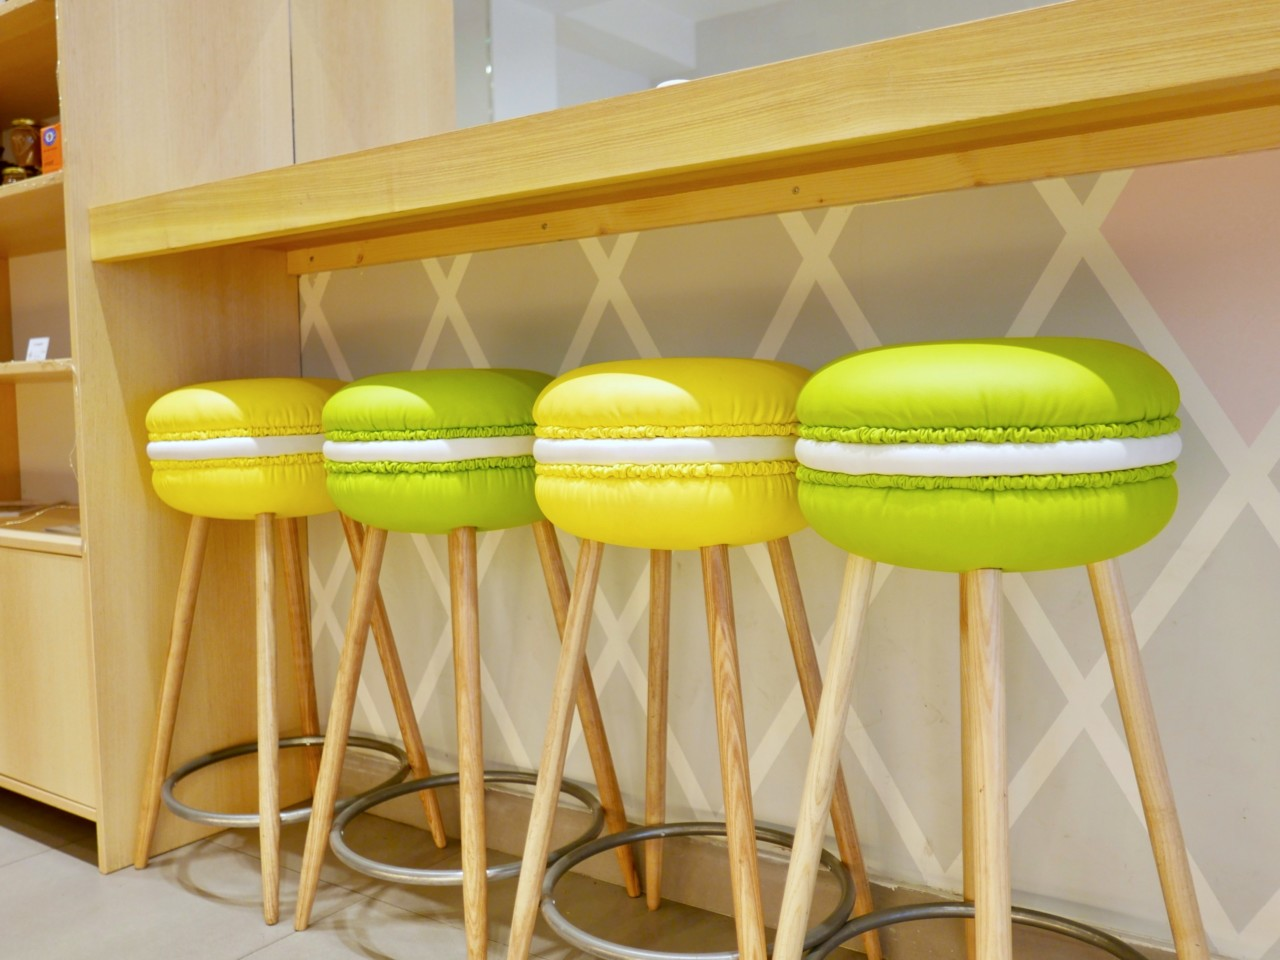 helmut-newcake-macarons-gluten-free-patisserie-paris